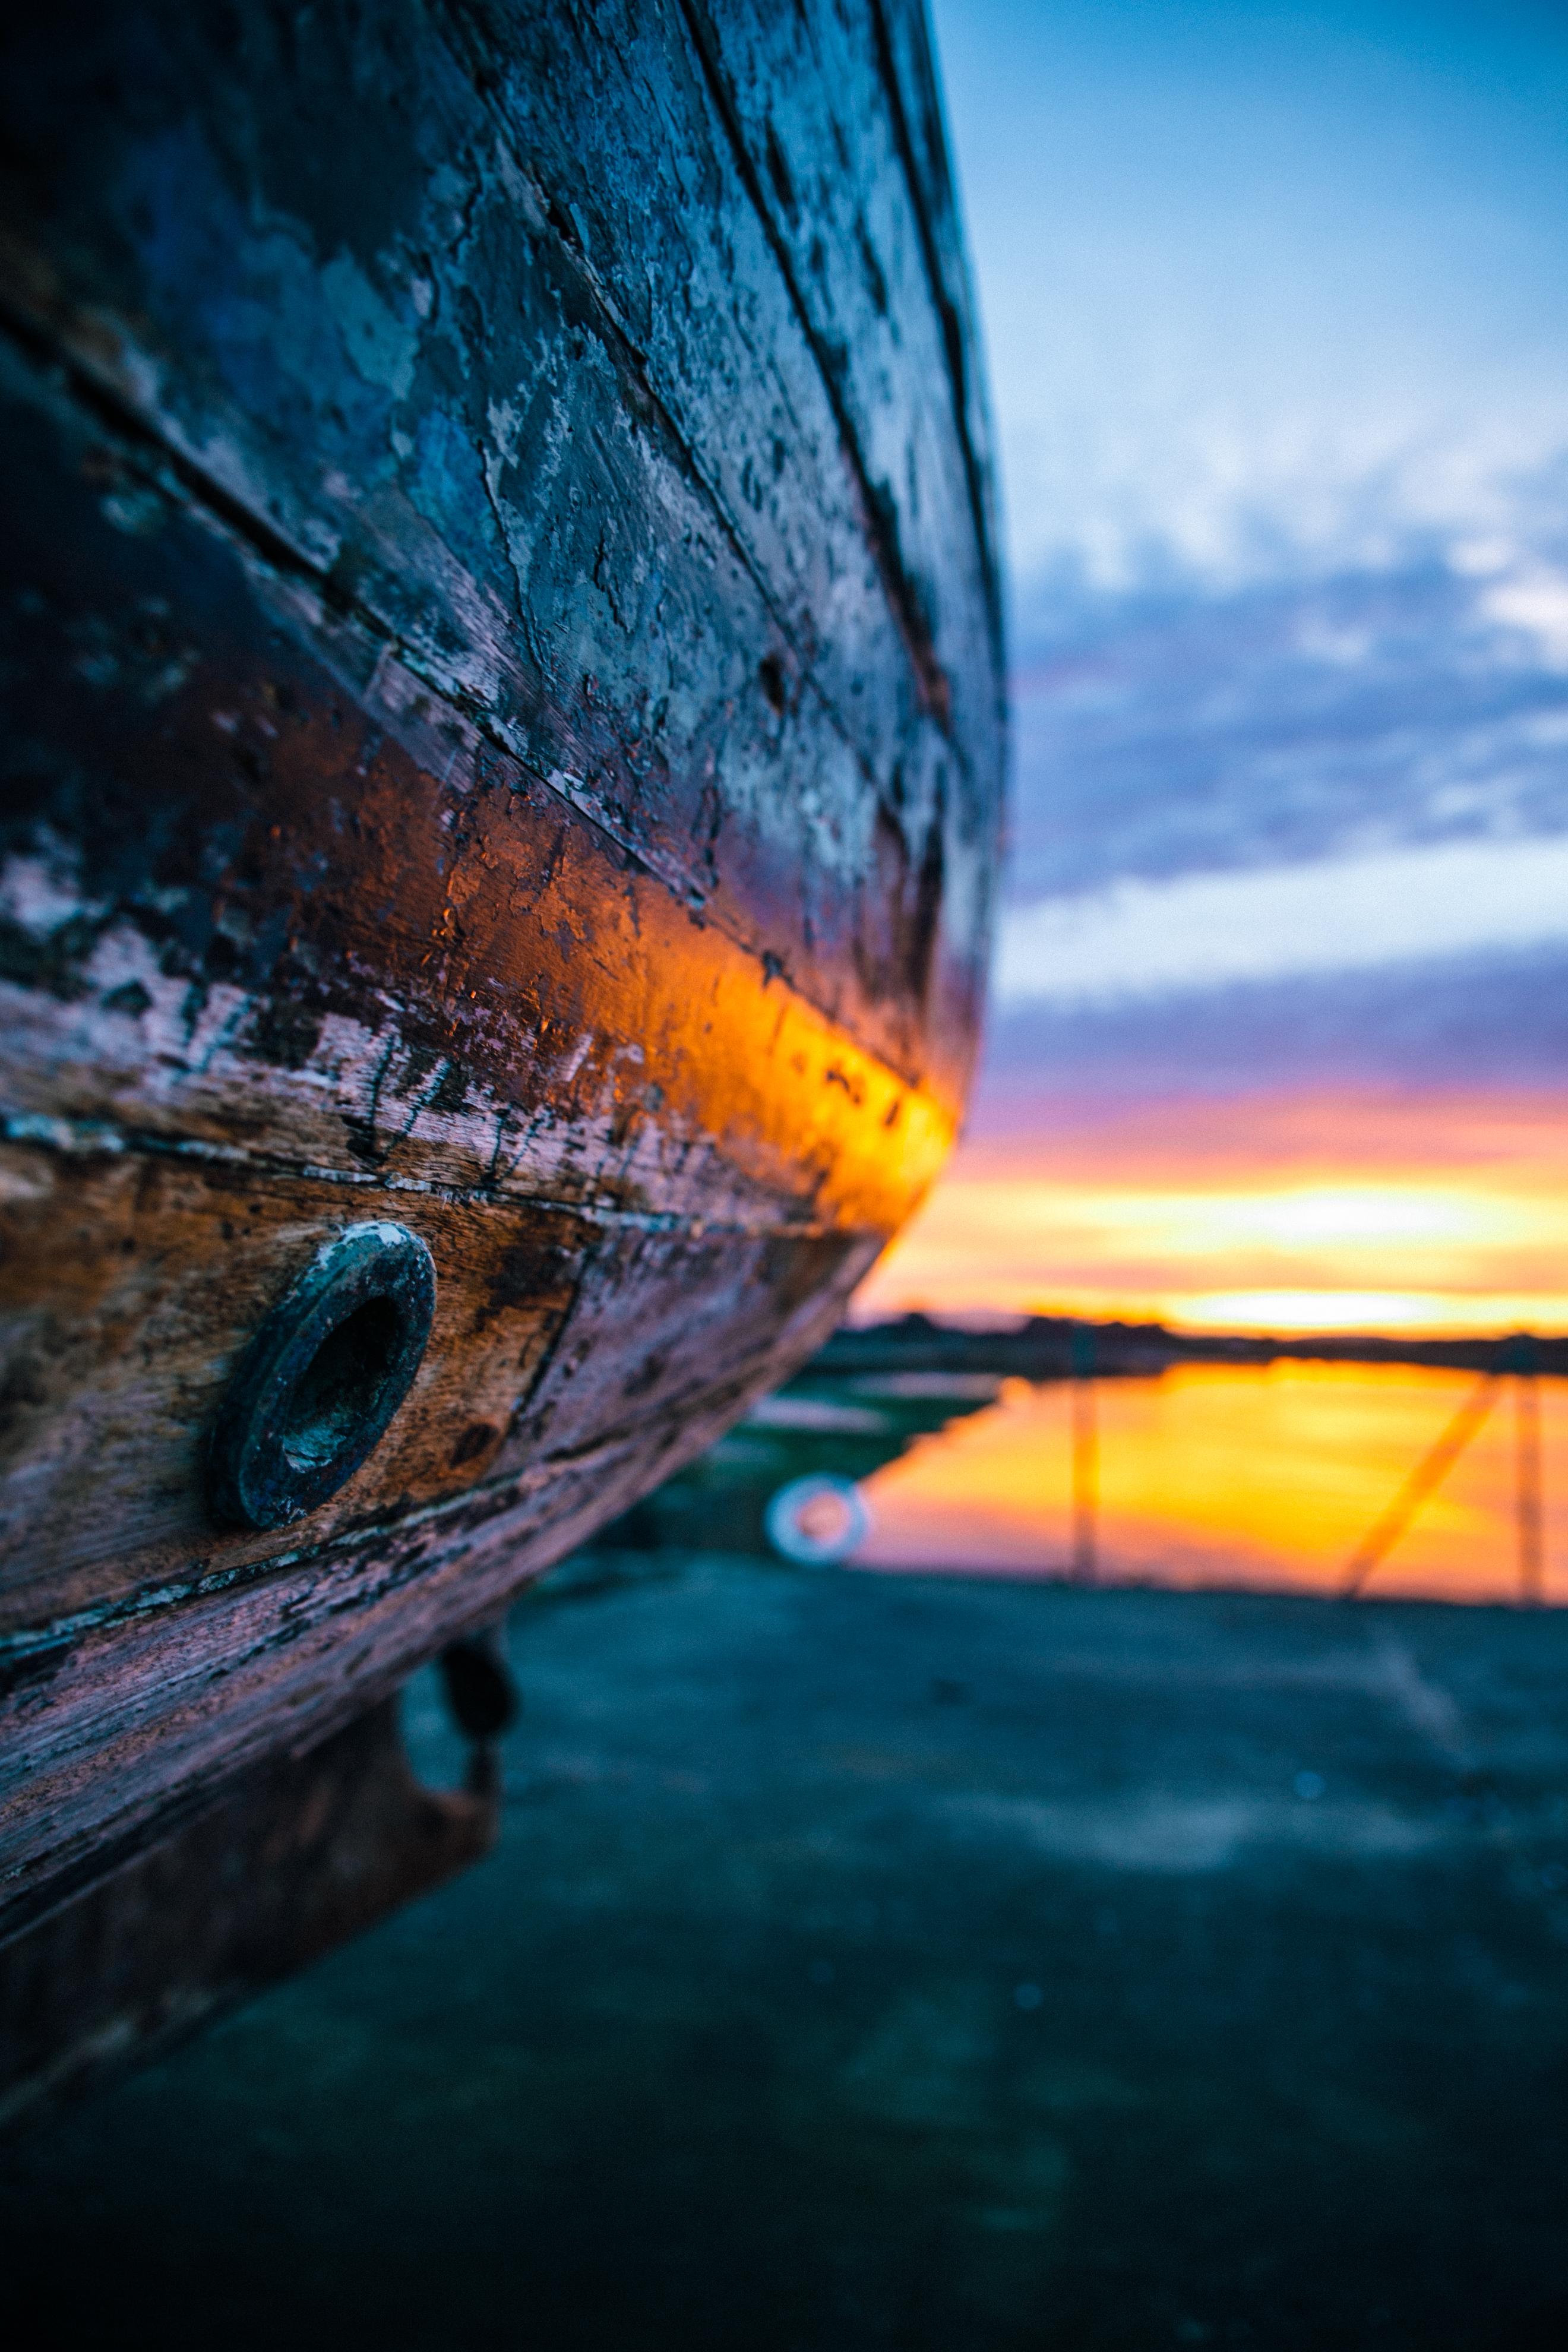 Old Pilot Boat (2), Boyne Estuary 2